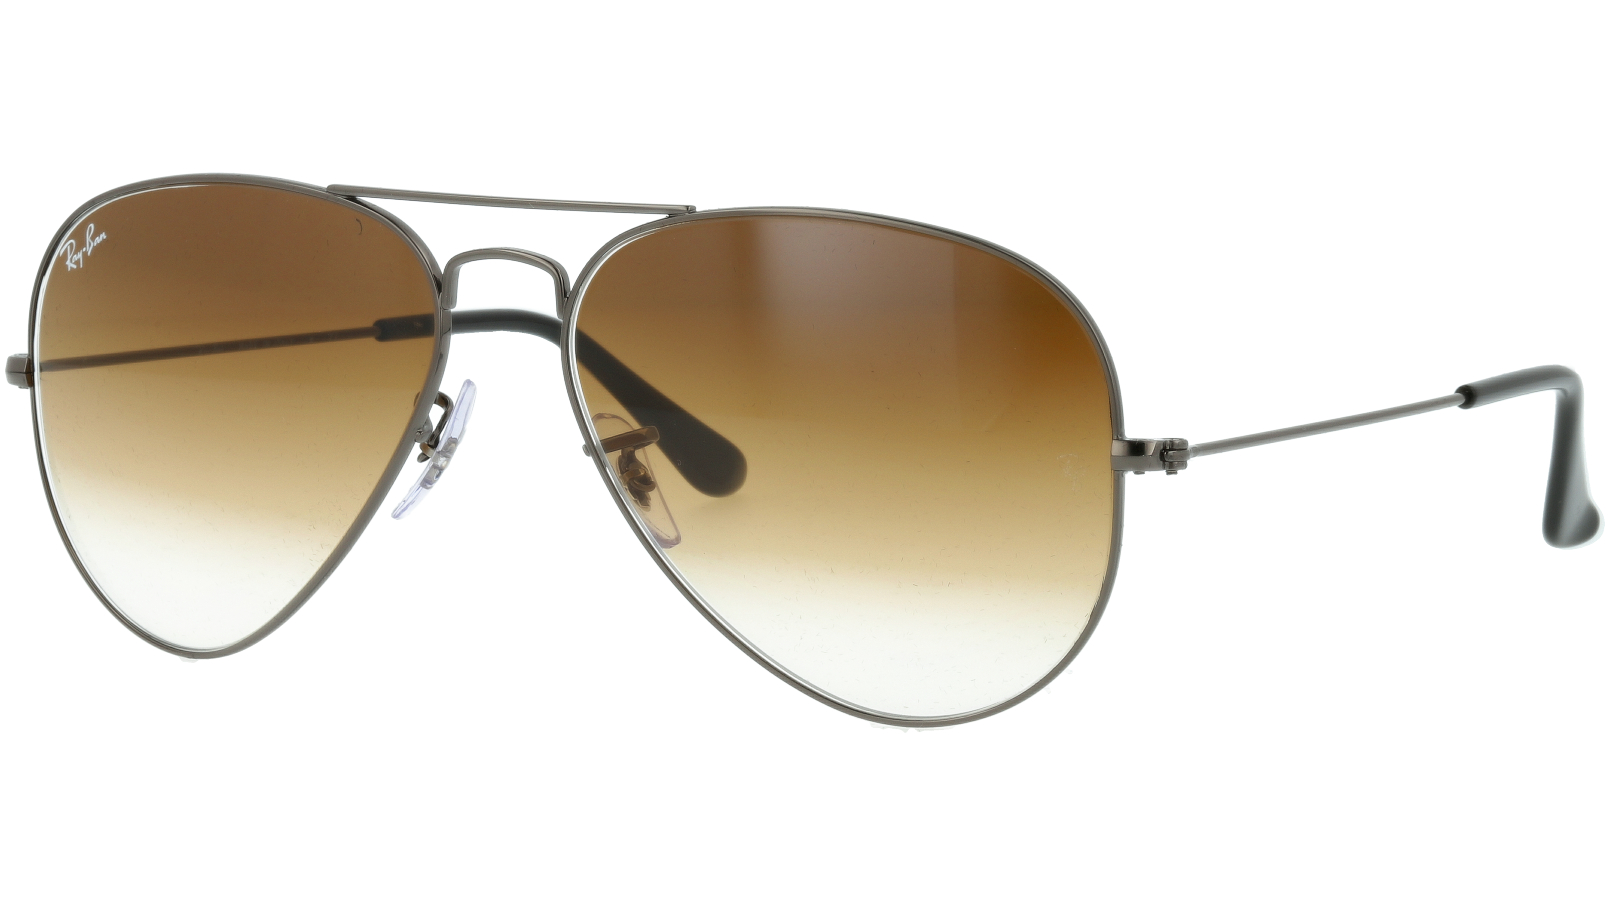 Ray-Ban RB3025 004/51 58 Gunmetal Pilot Sunglasses